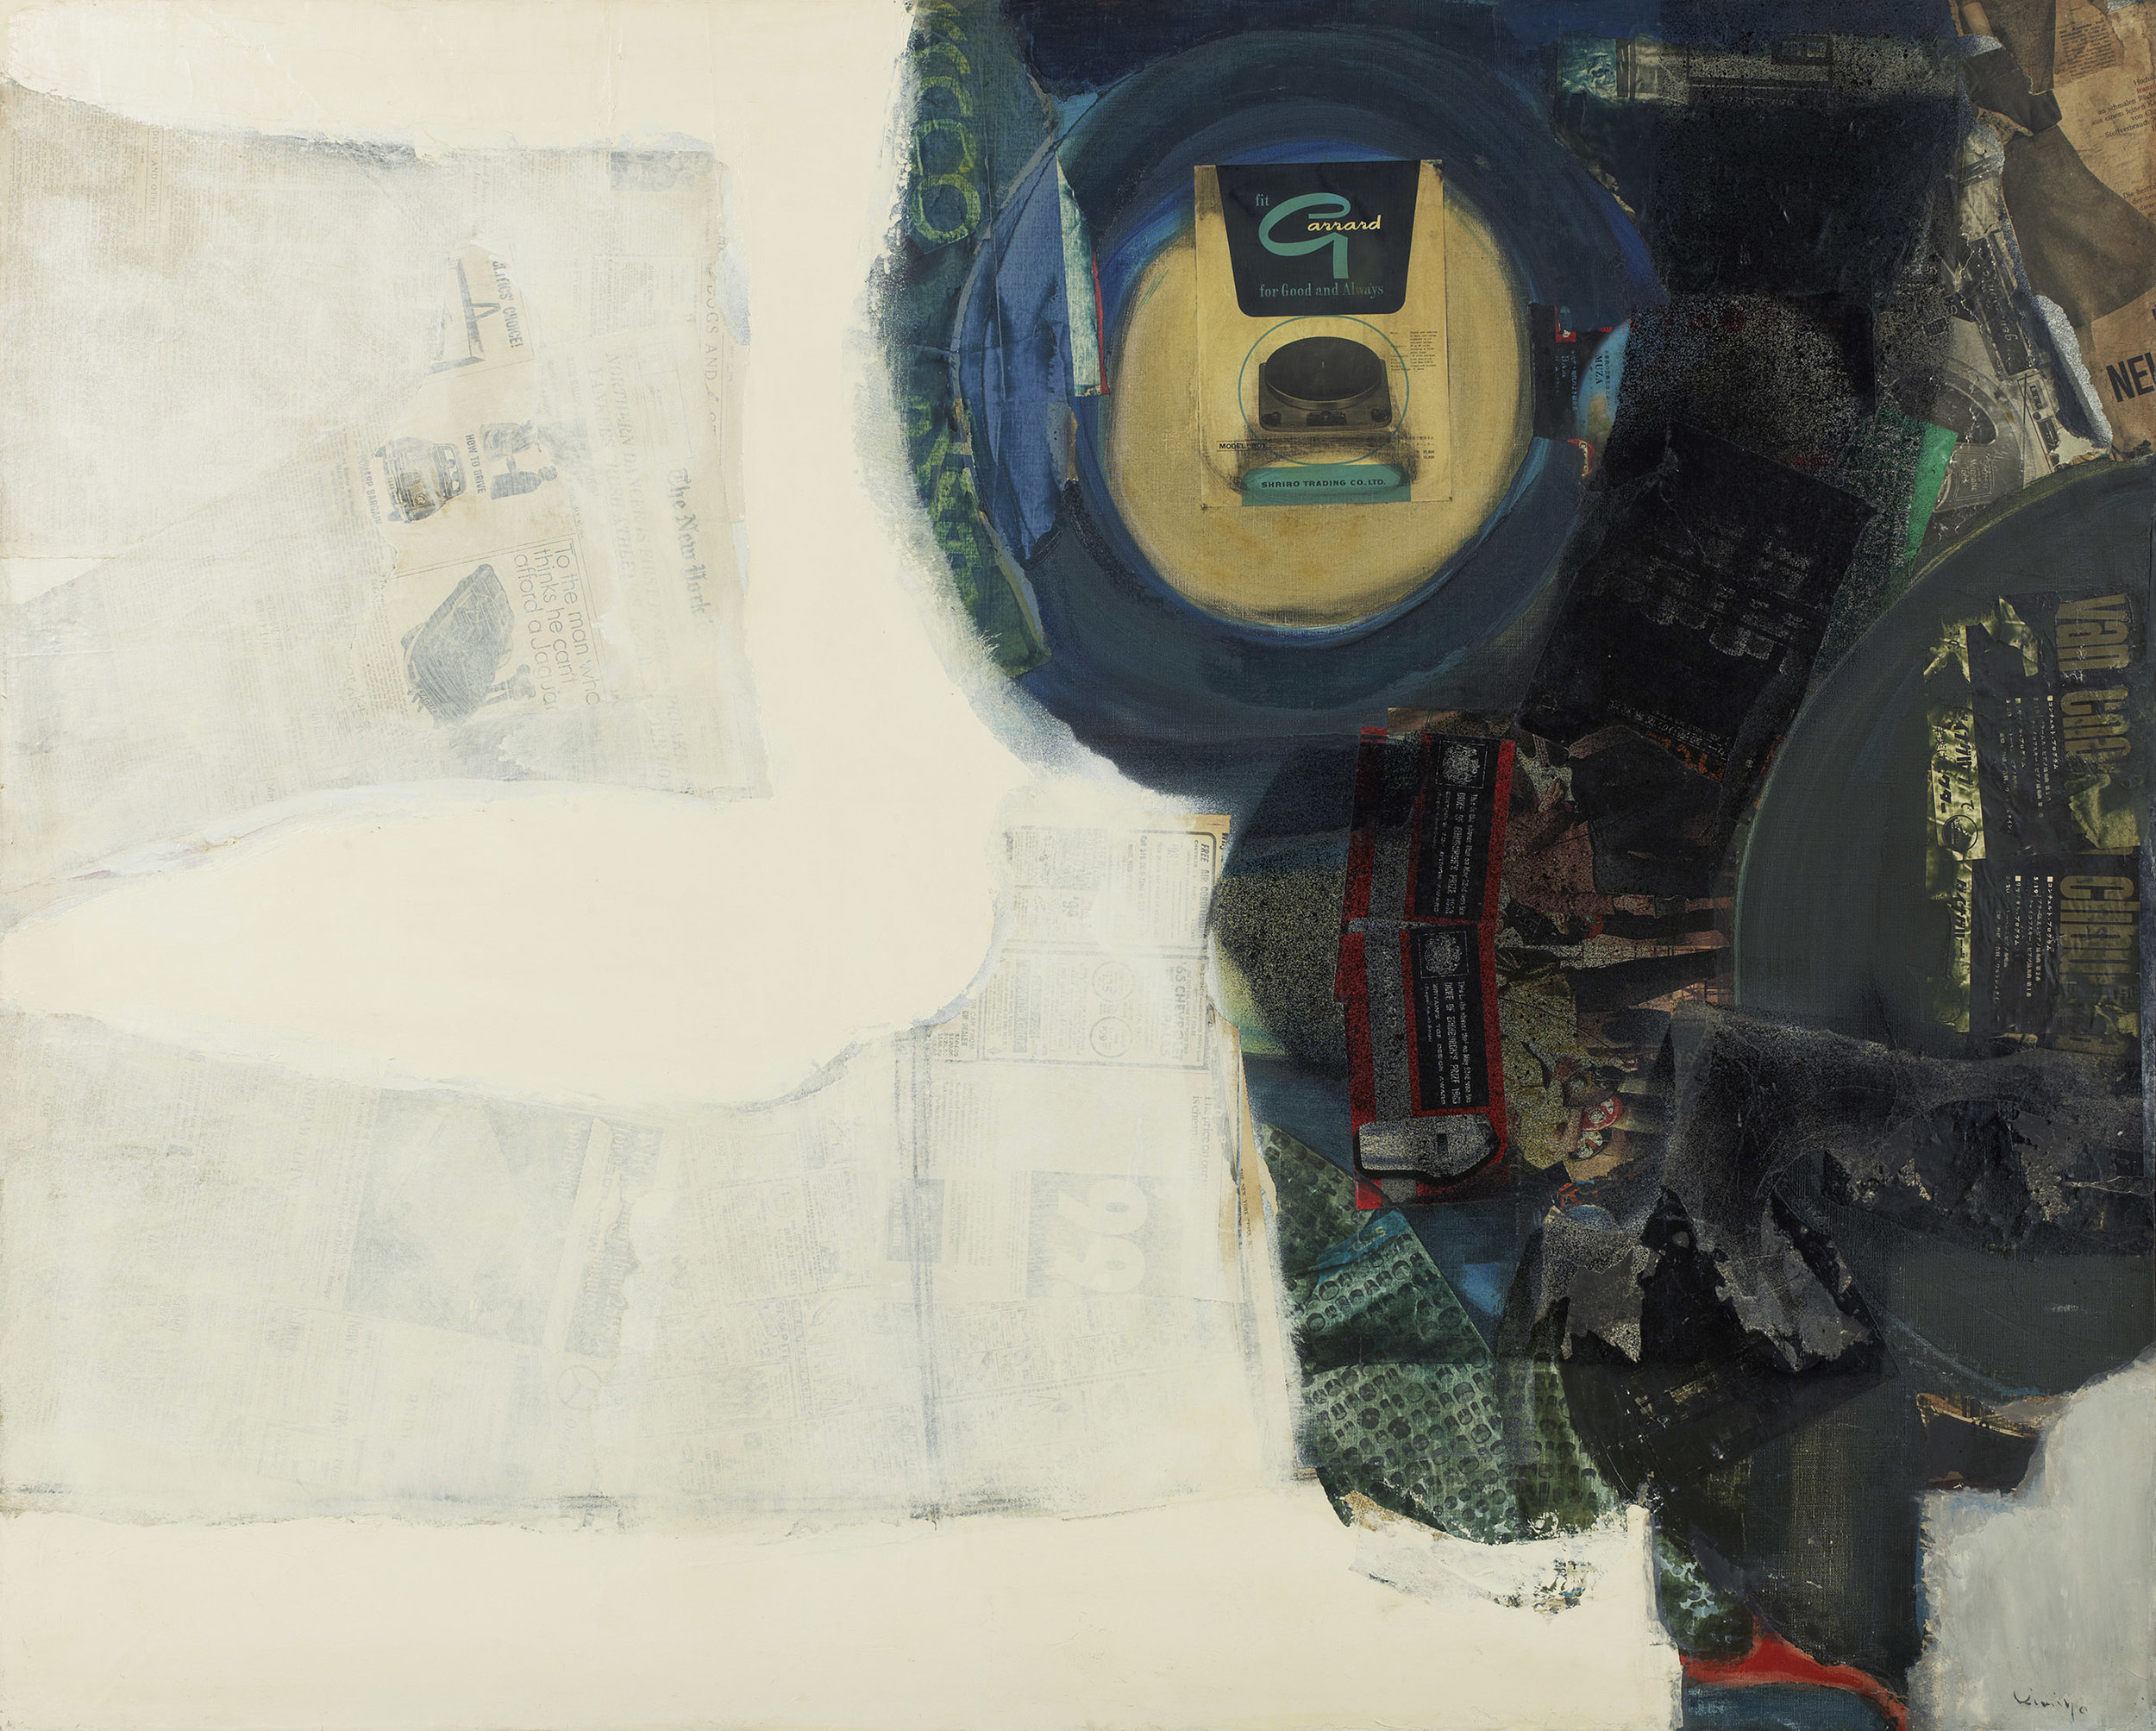 """Work 66-W"", 1966"